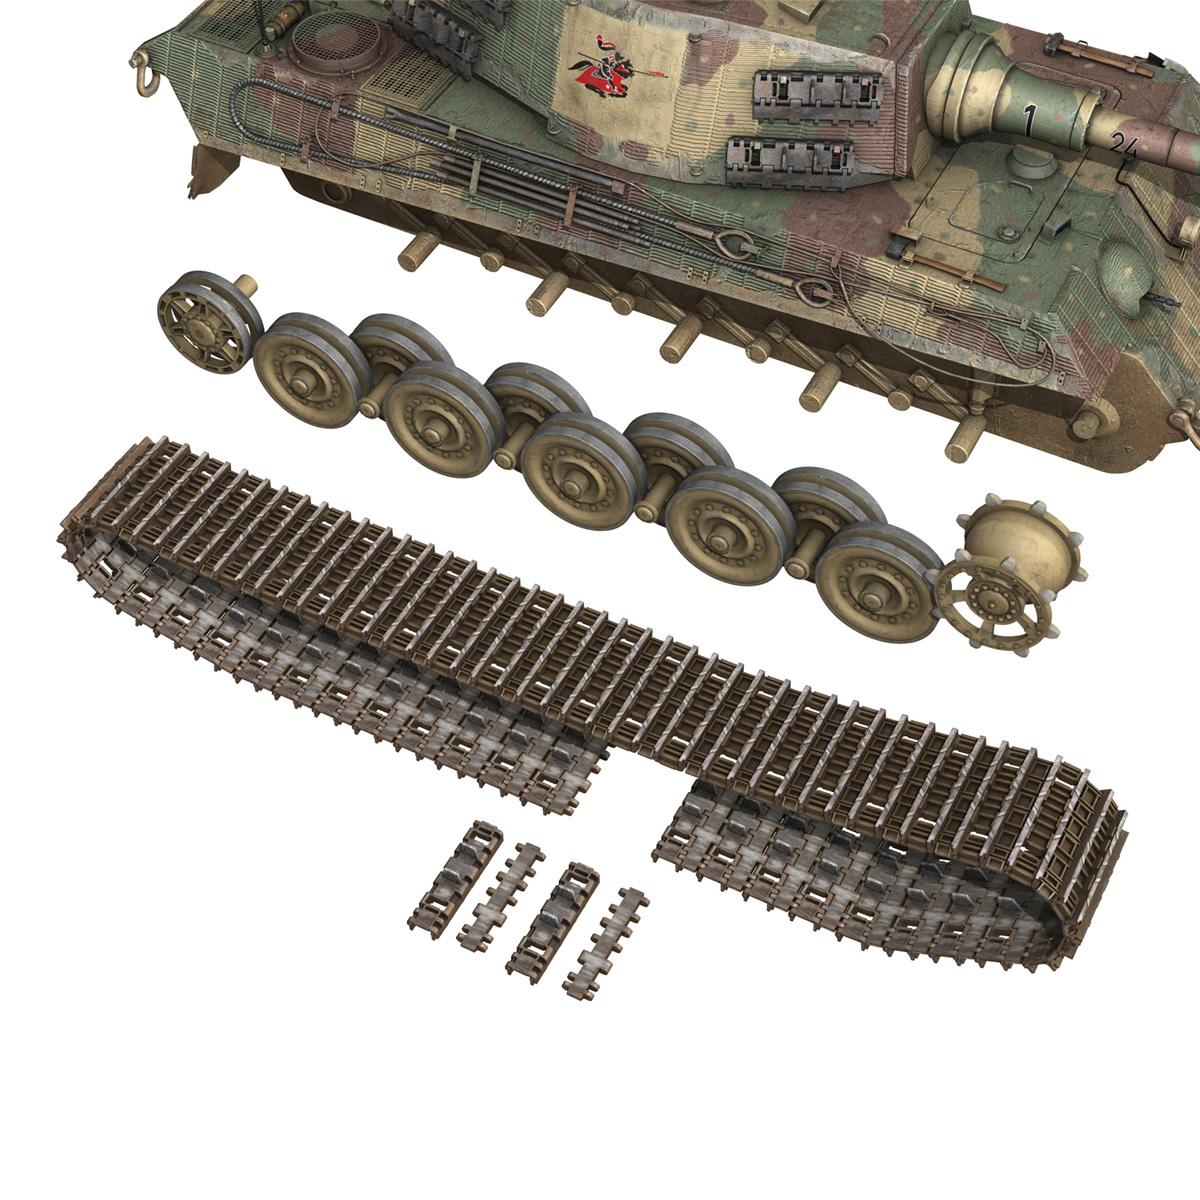 Panzerkampfwagen VI - Ausf B - Tiger II - 124 3d model 3ds c4d lwo lws lw obj 273763